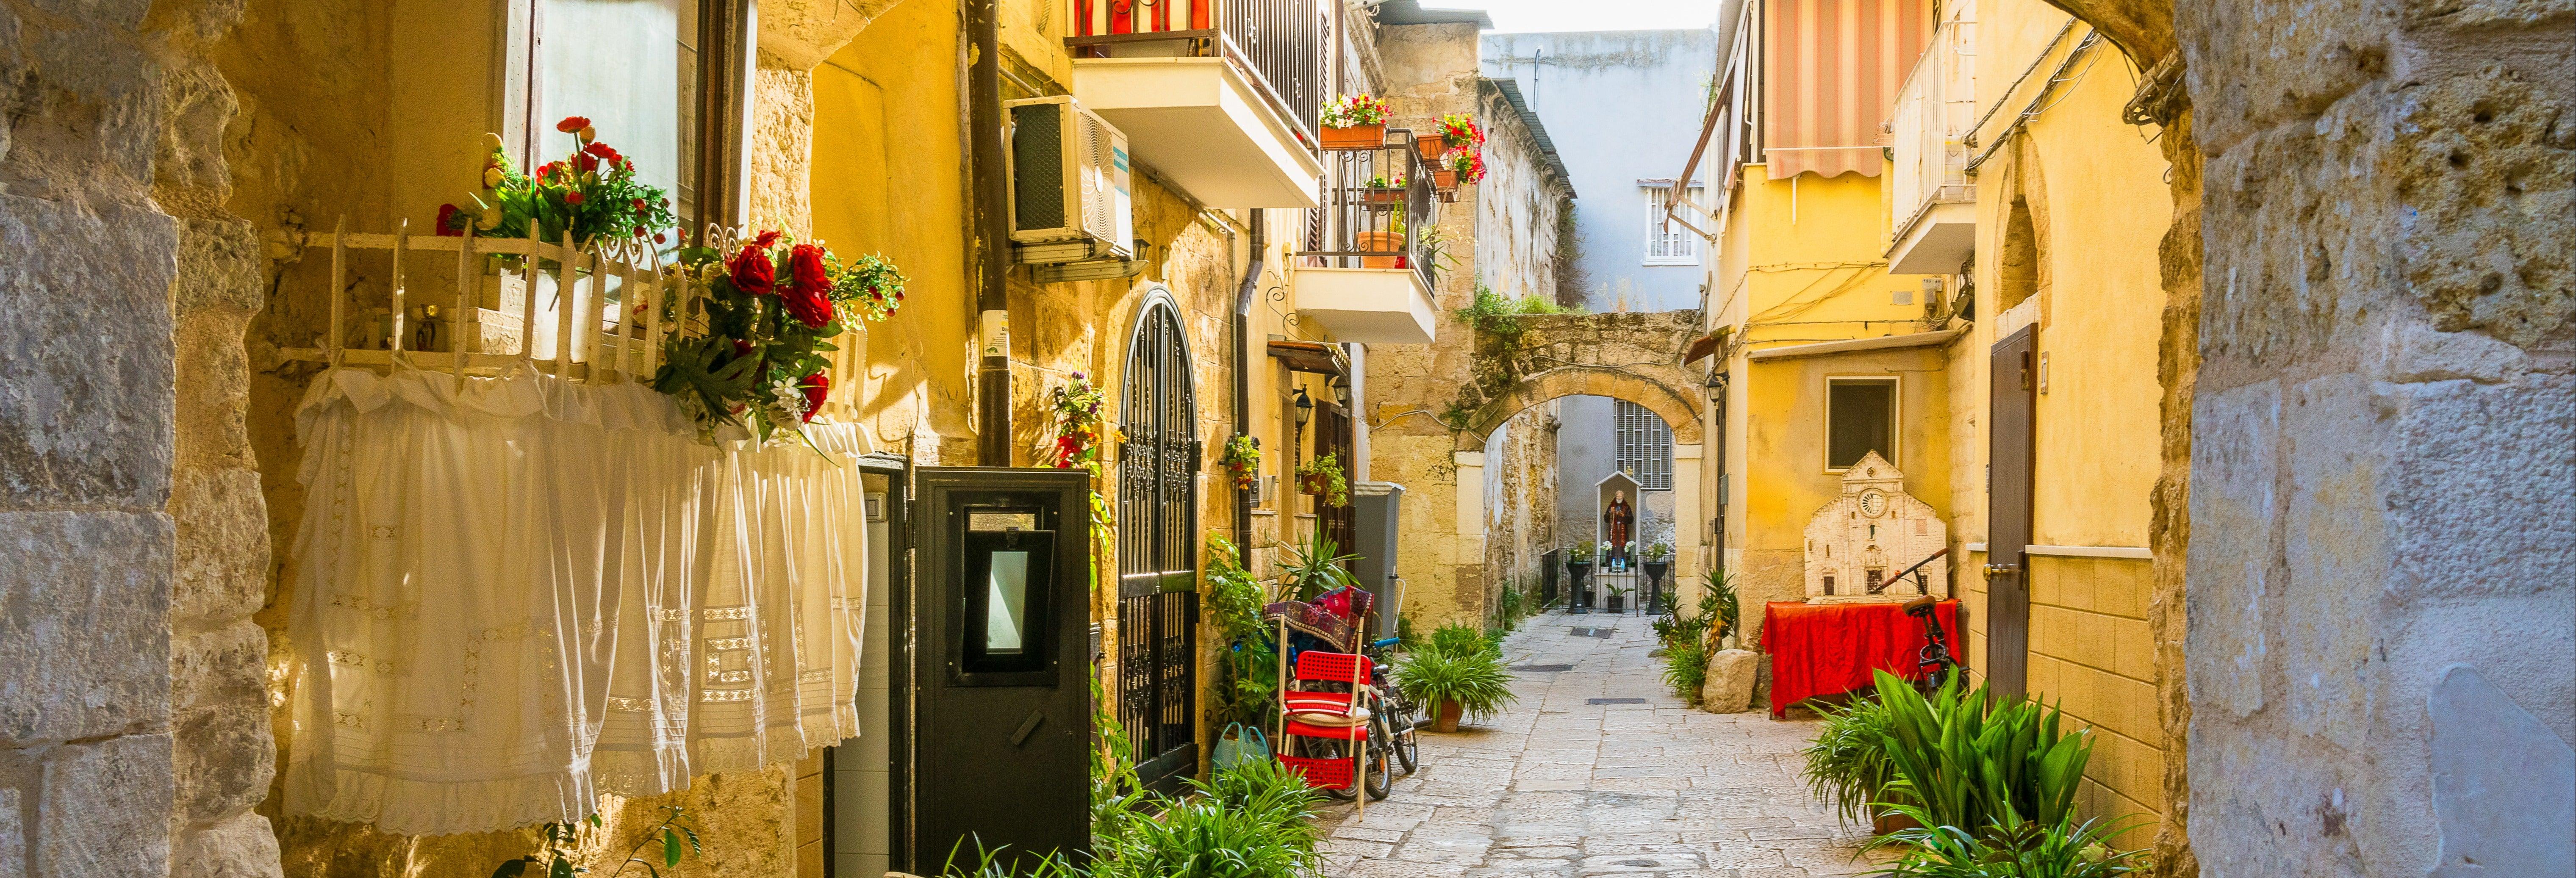 Visita guiada por Bari